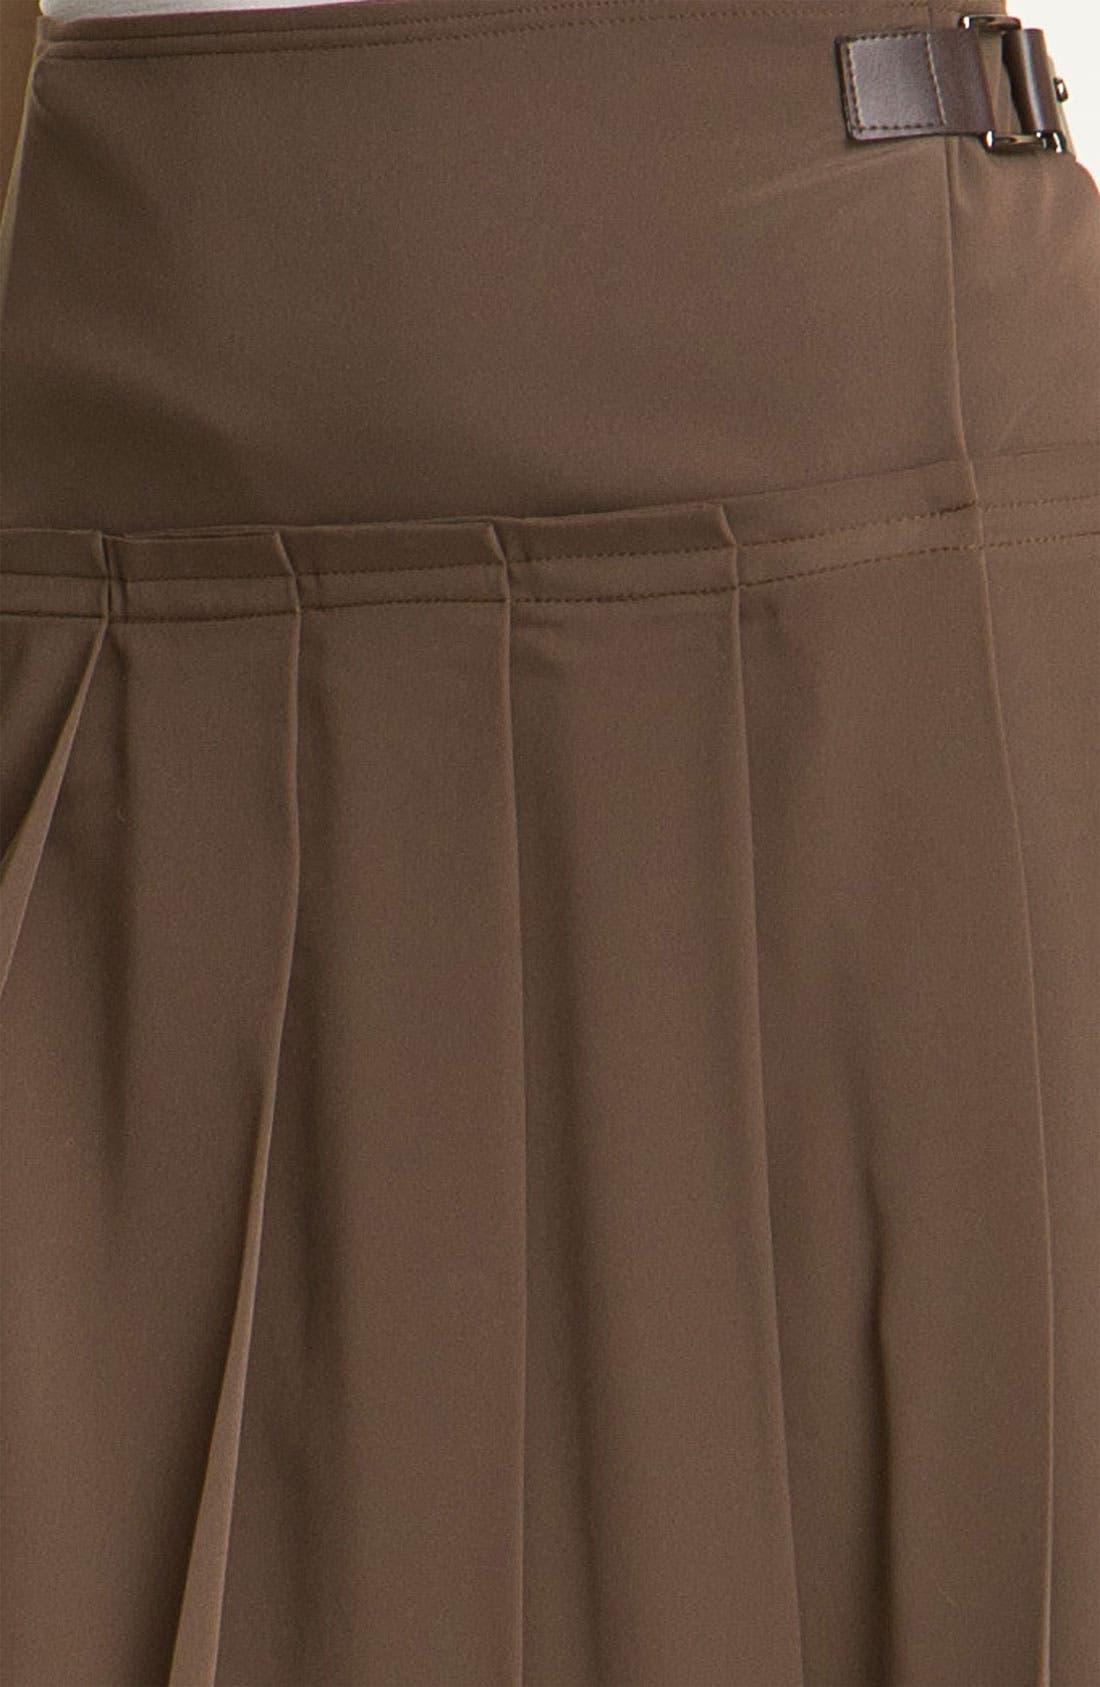 Alternate Image 3  - Weekend Max Mara 'Rivera' Wrap Skirt